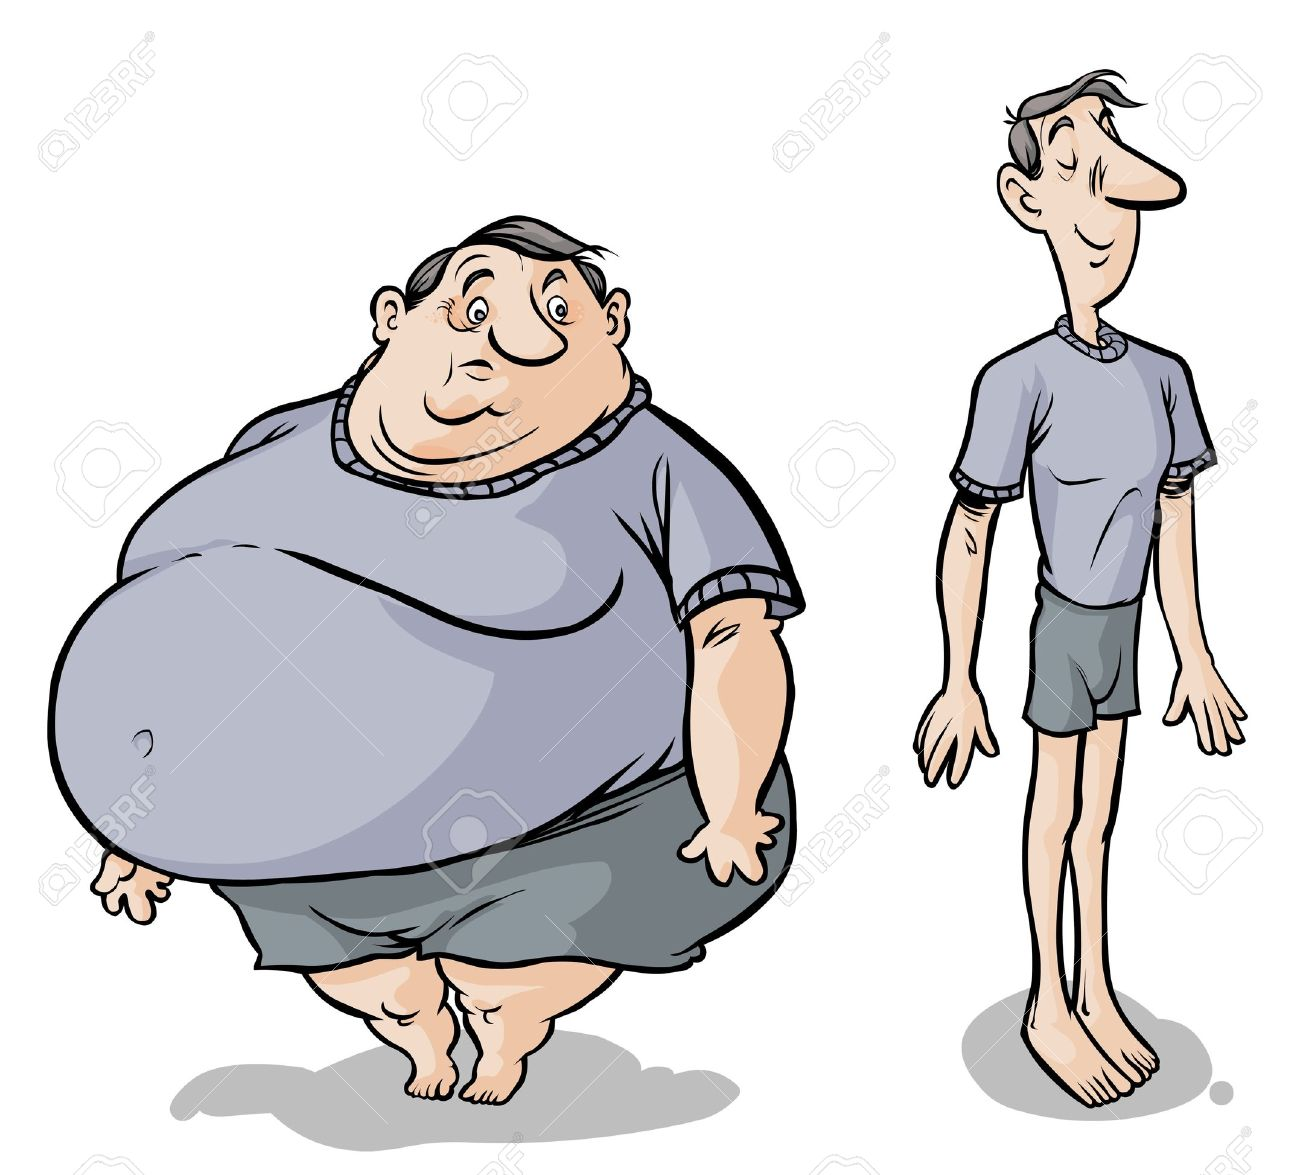 18786098-Cartoon-Fat-slim-male-characters--Stock-Vector-thin.jpg (1300×1175)